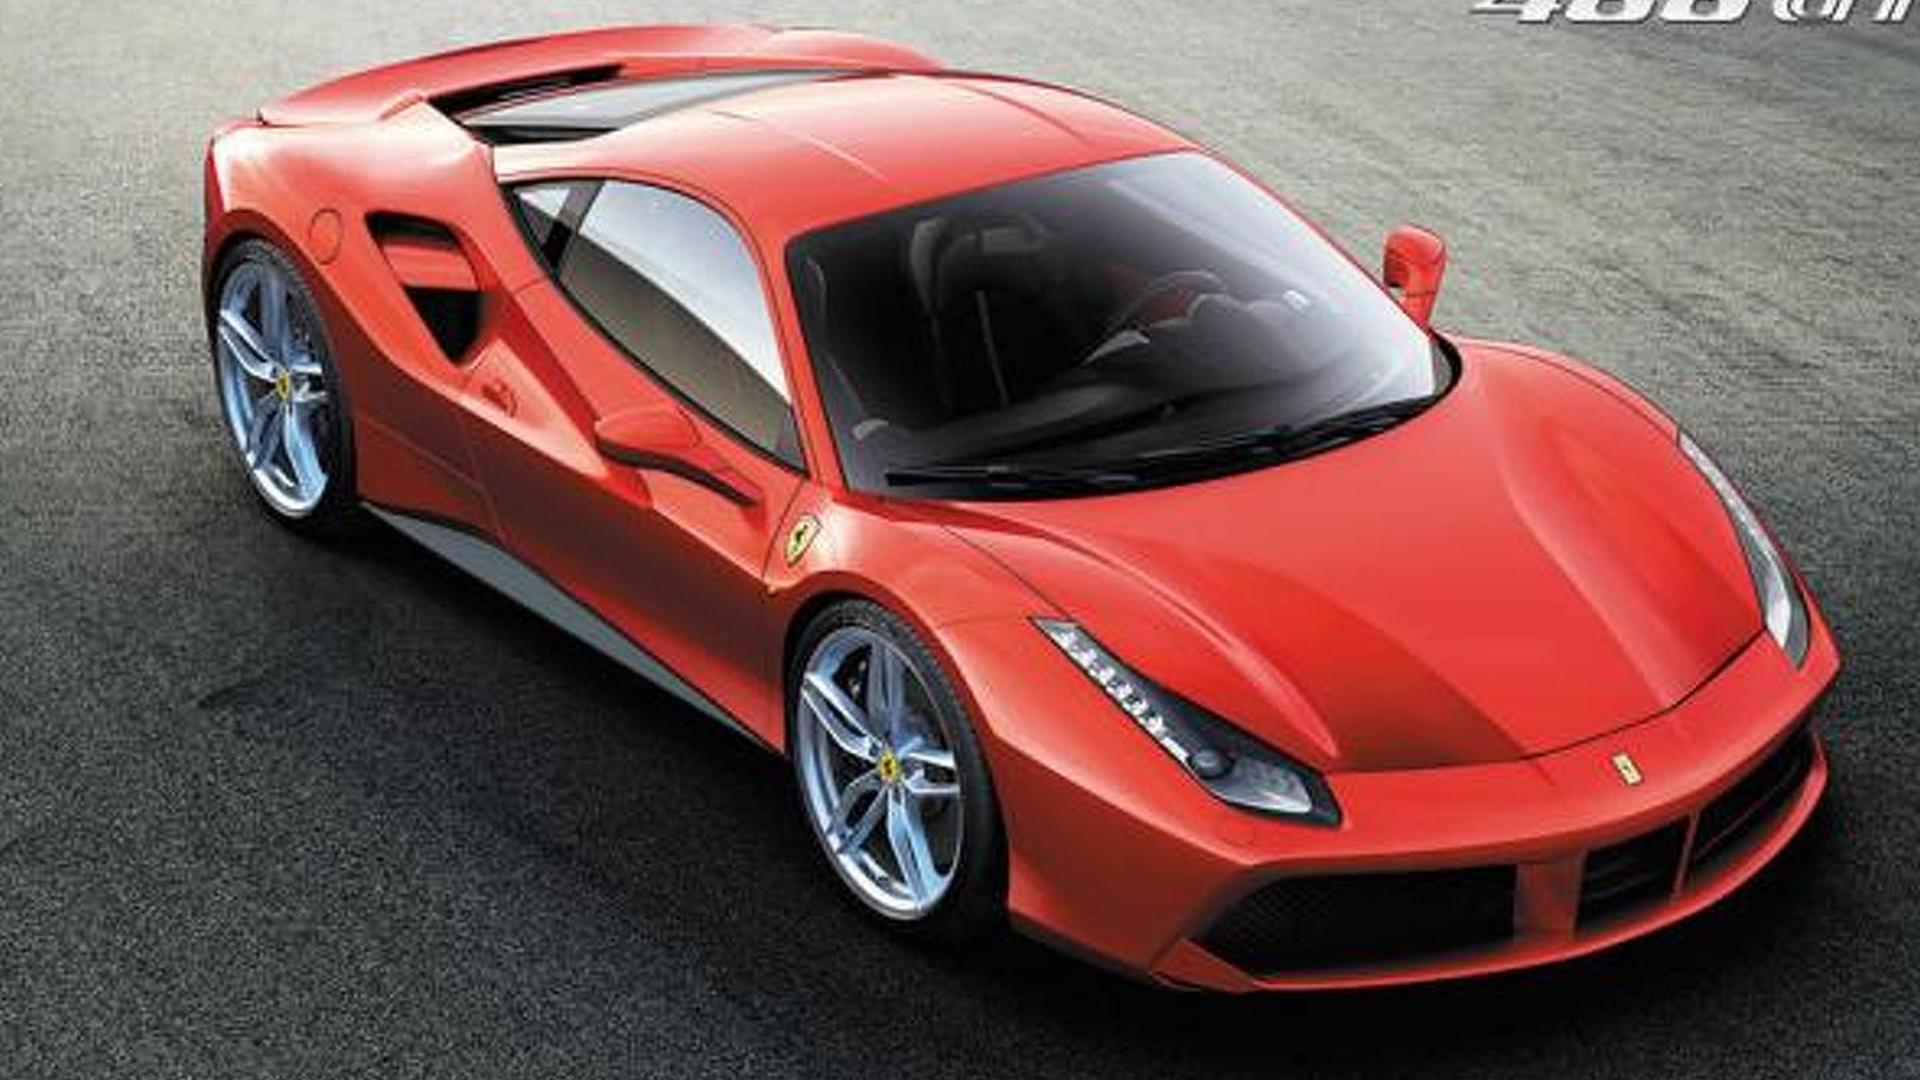 Ferrari 488 Gtb Revealed With Twin Turbo V8 Engine